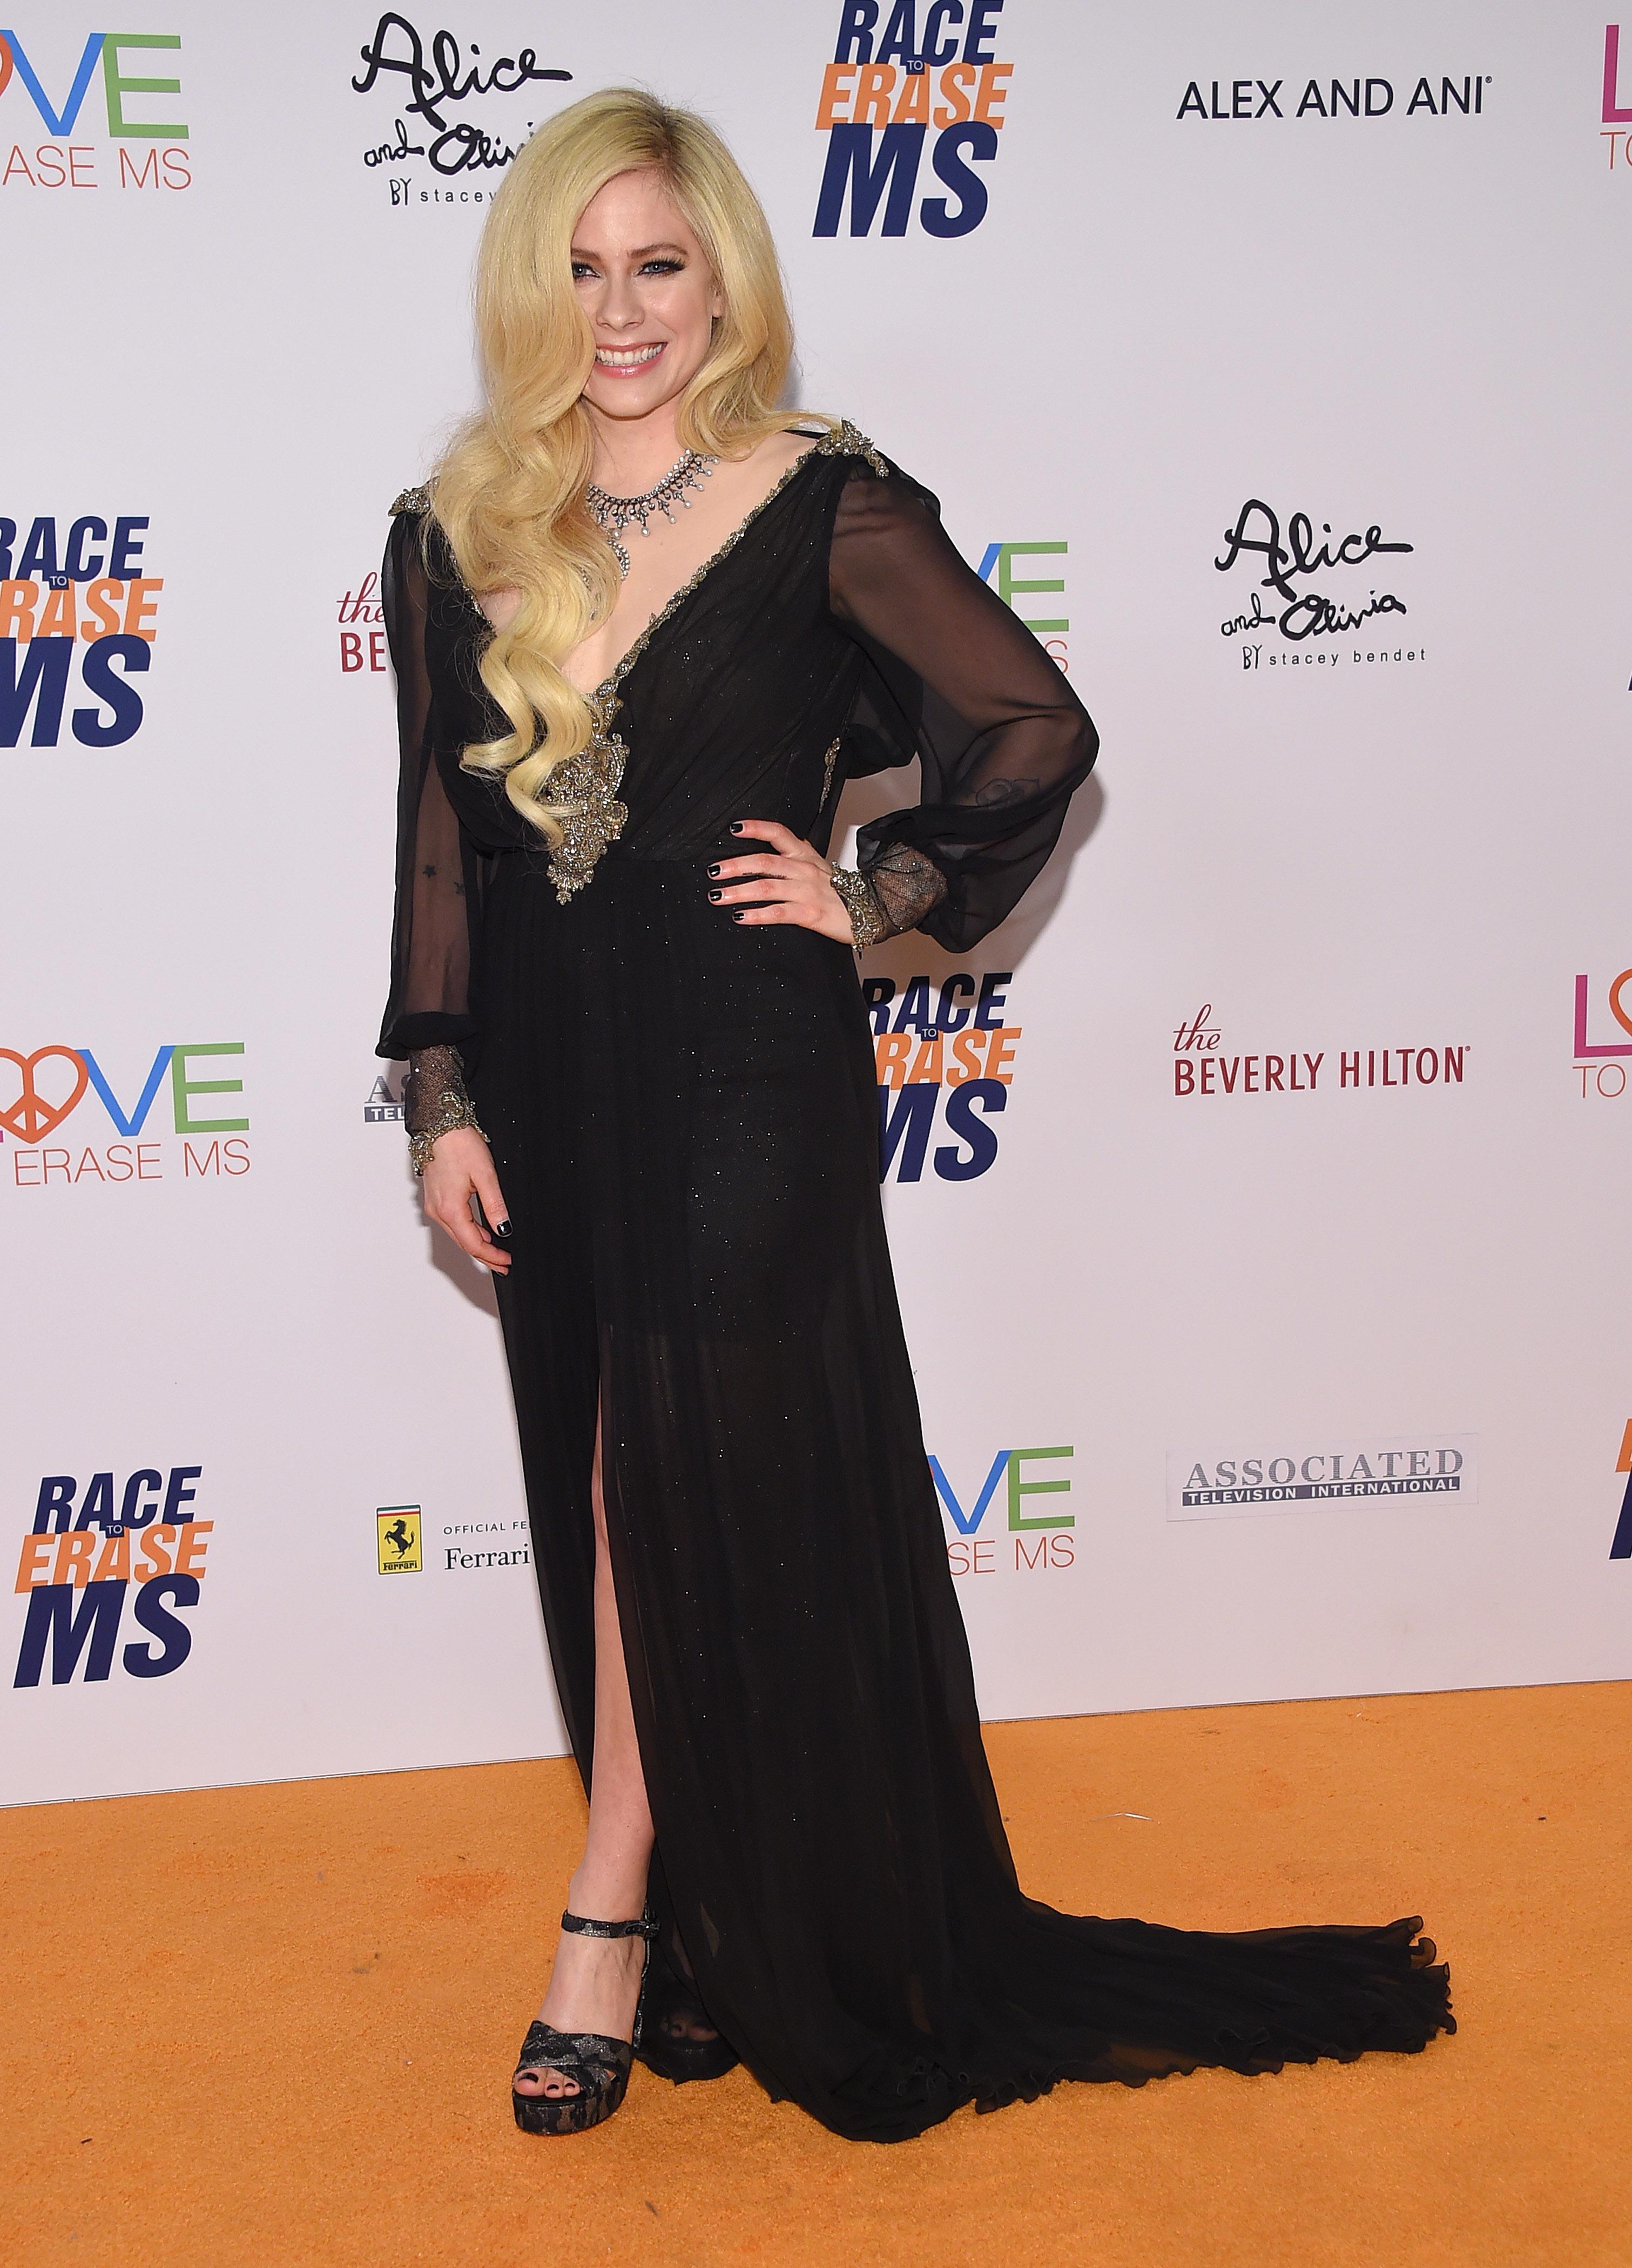 Avril Lavigne is reportedly dating billionaire Phillip Sarofim